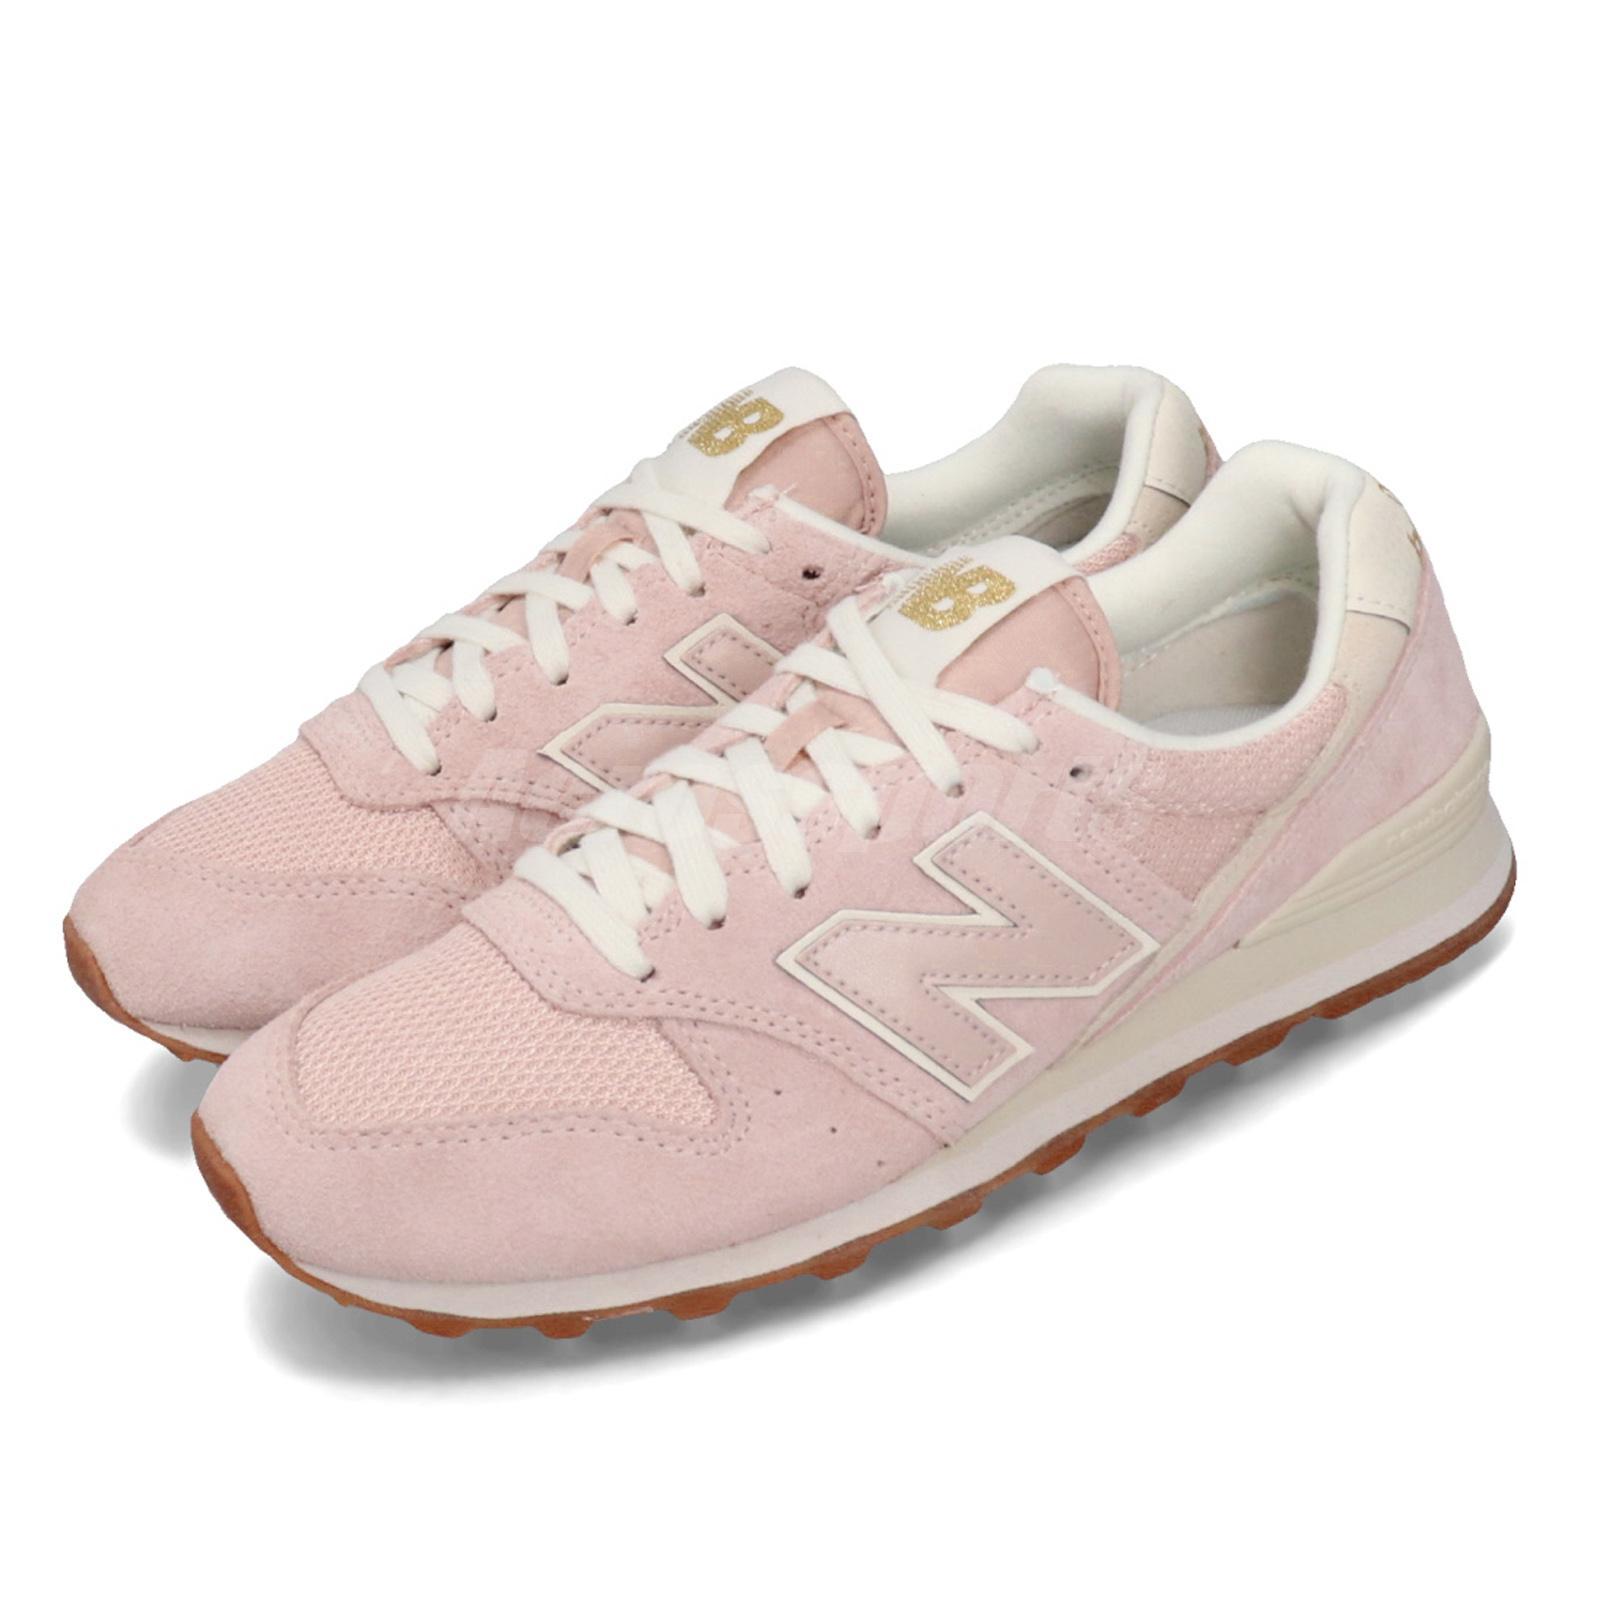 New Balance WL996 996 Pink Beige Gold